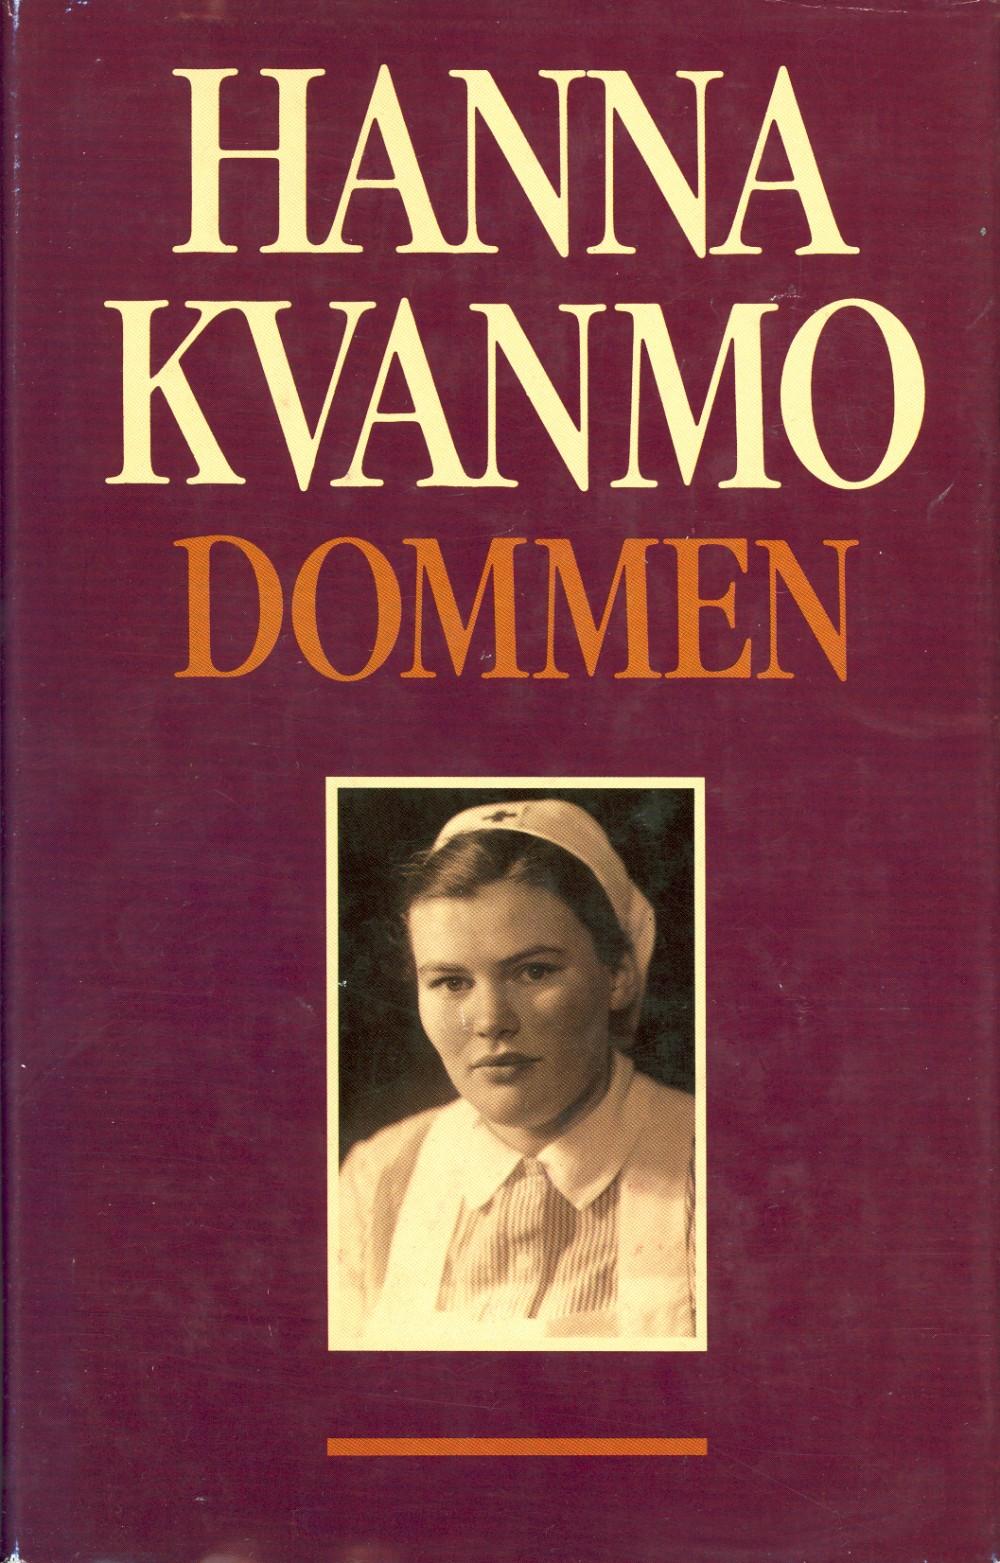 Hanna Kvanmo: Dommen